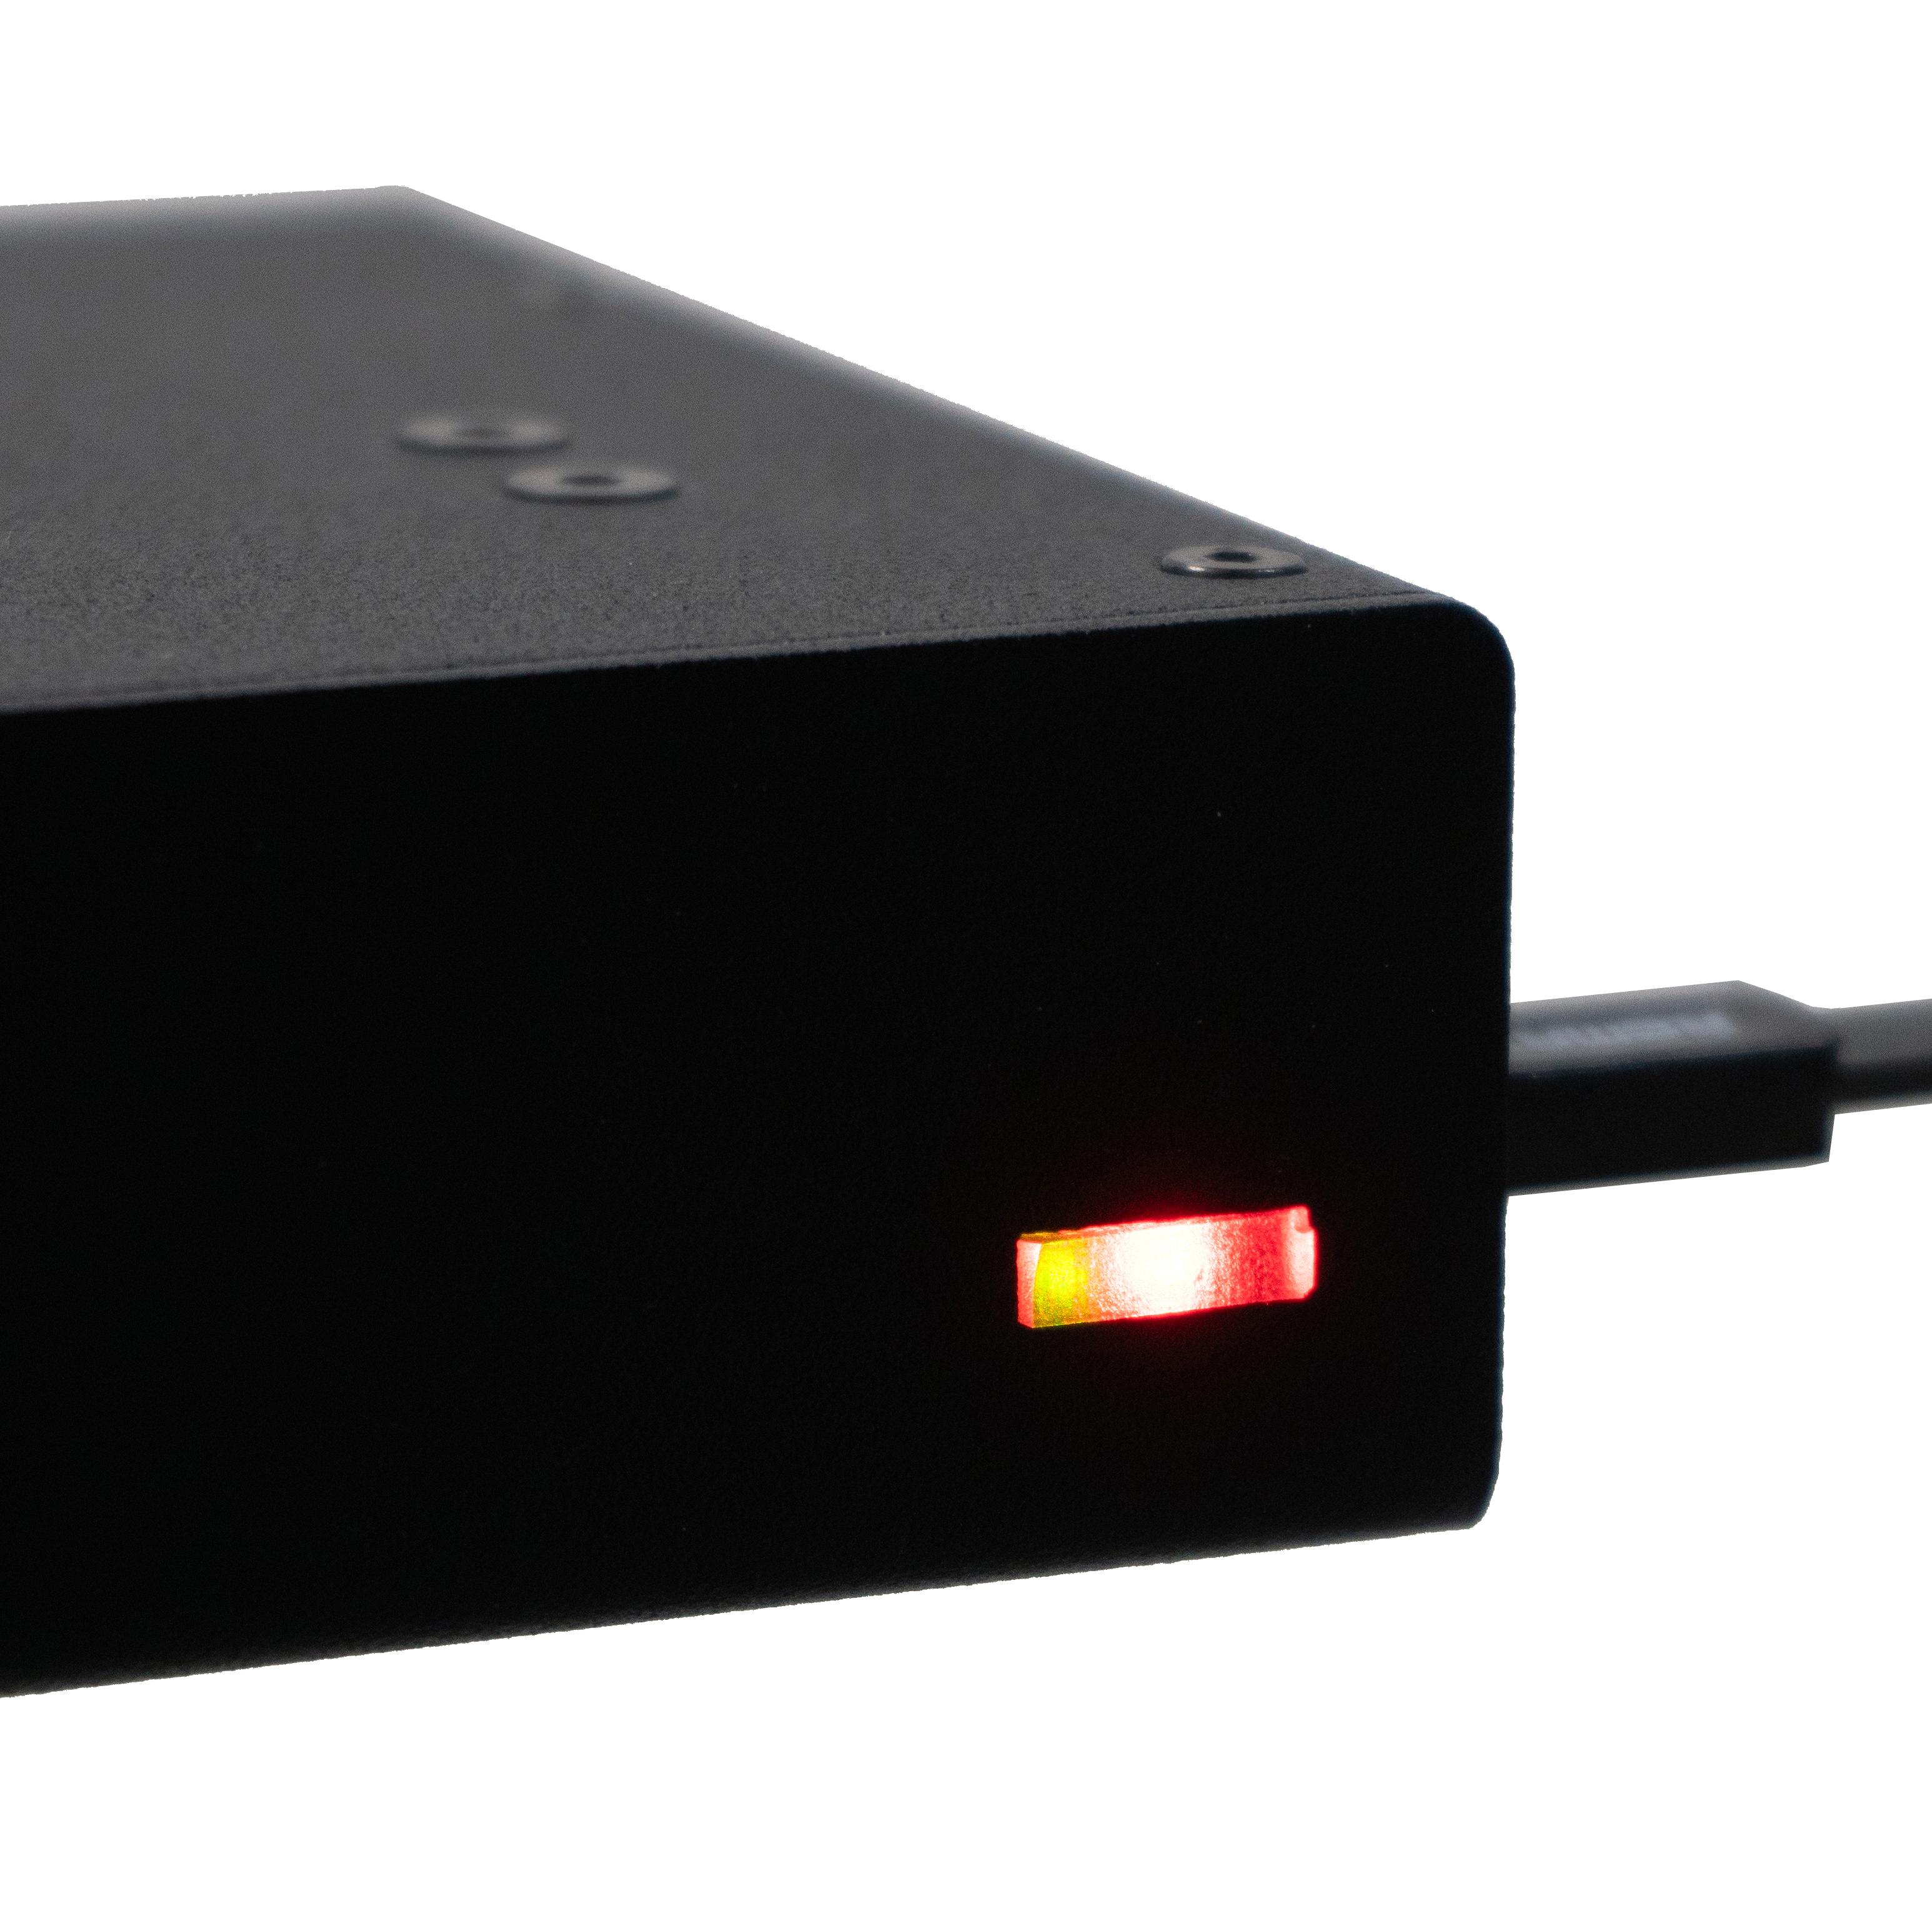 Тонкий клиент thinBox 4 WTWare